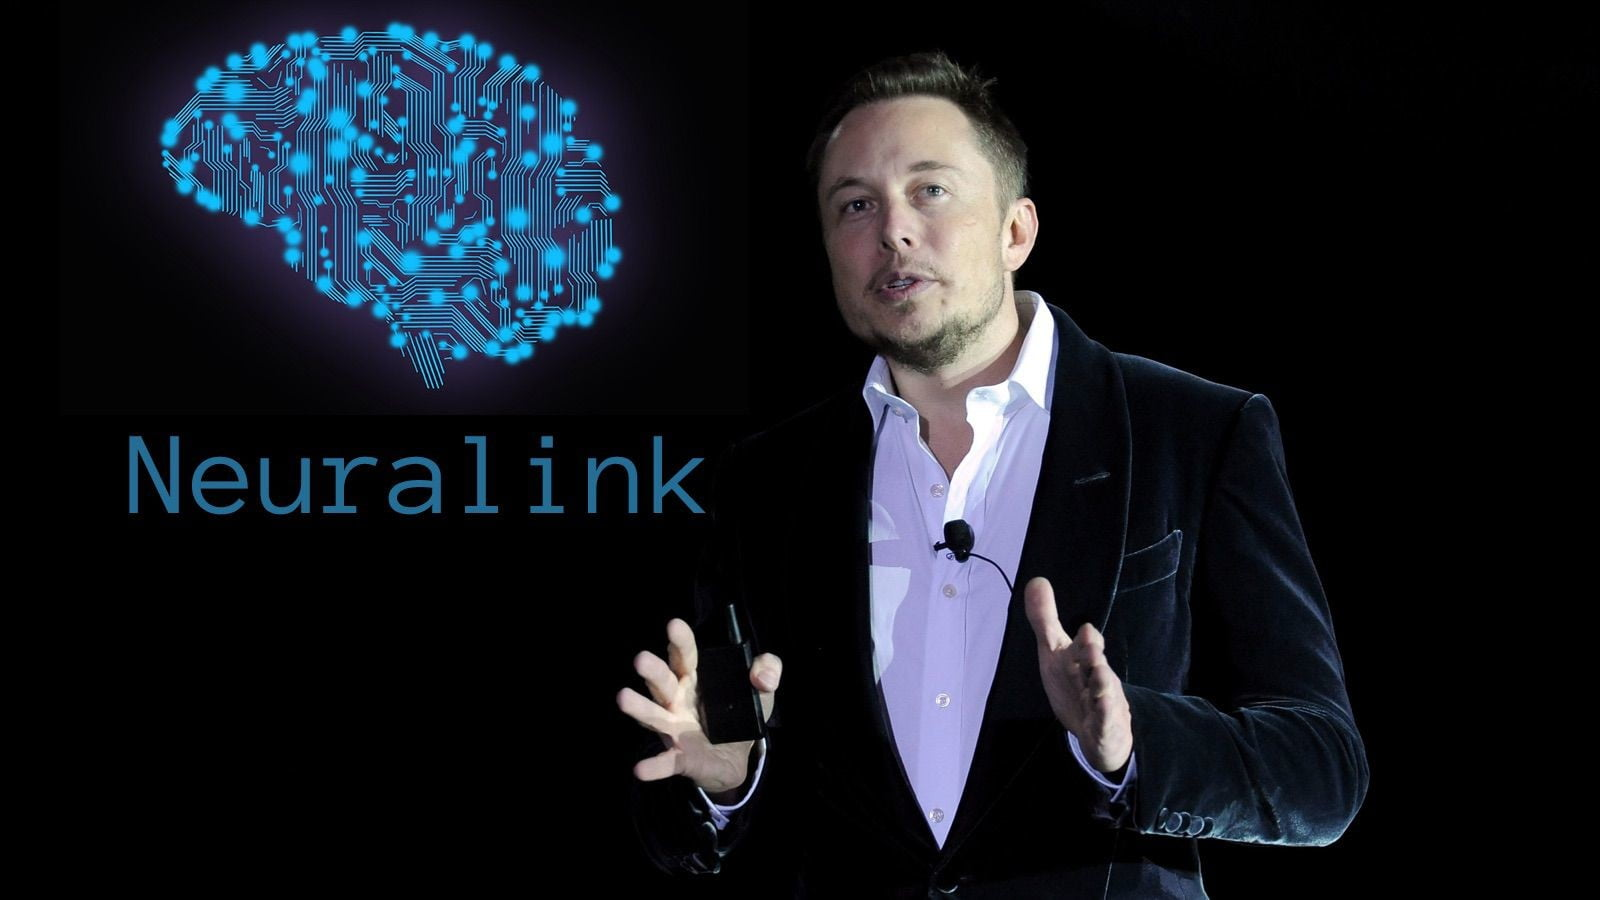 finalmente-sapremo-neuralink-progetto-segreto-elon-musk-v3-388343